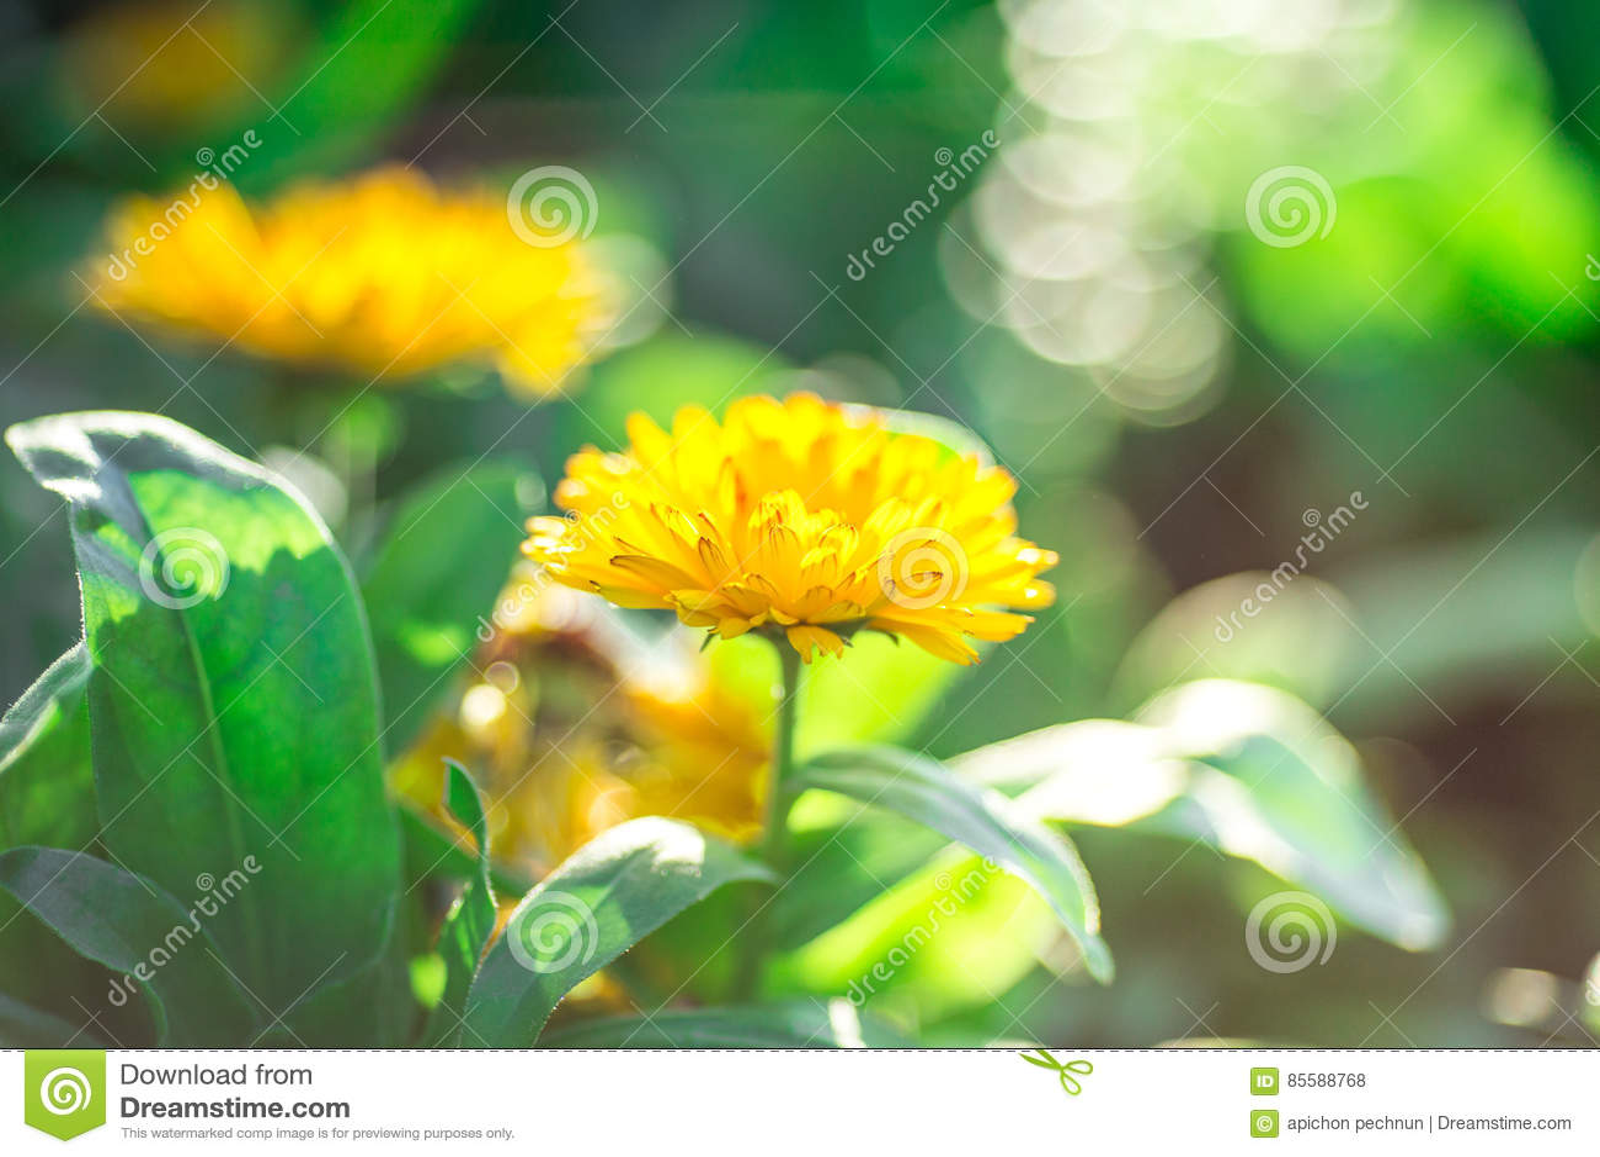 Soft Focus Yellow Flowers Beautiful Stock Photo Image Of Bright